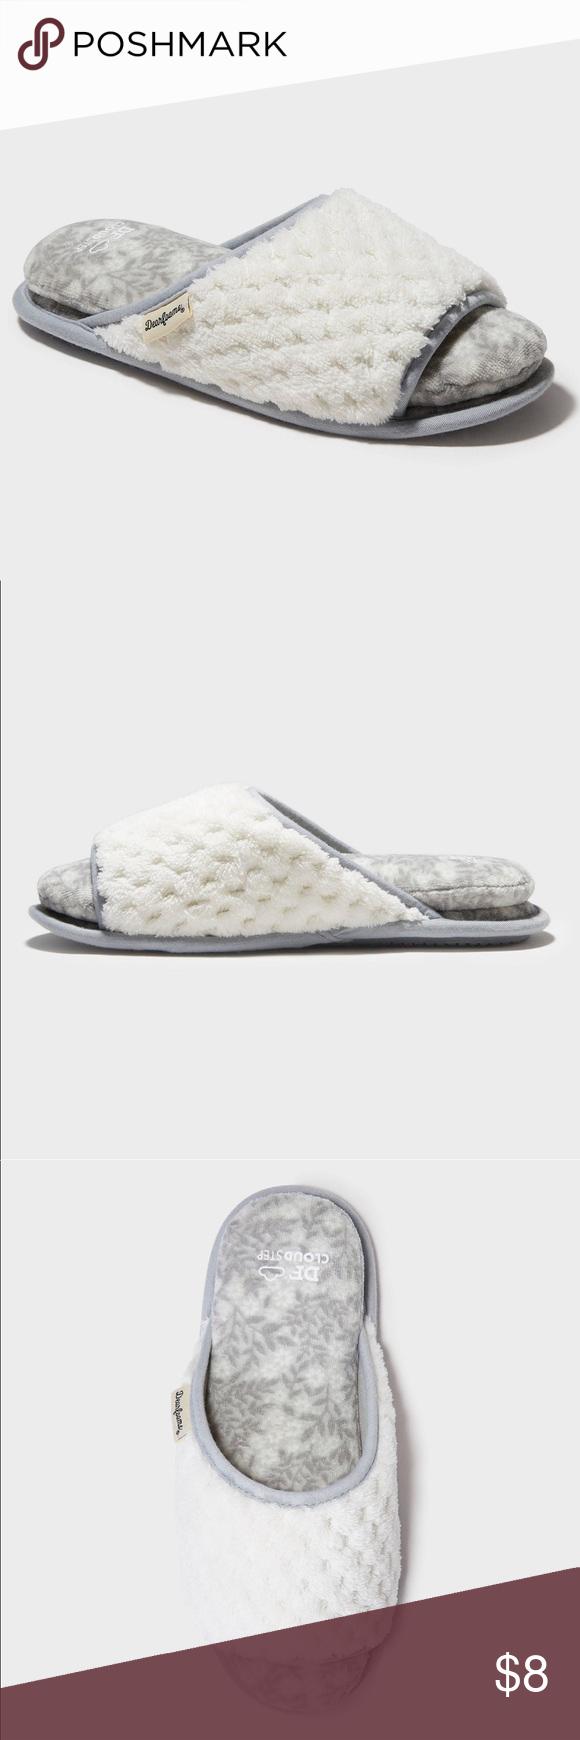 🟢 3/$12 NWT Women's Cloud Step Slippers